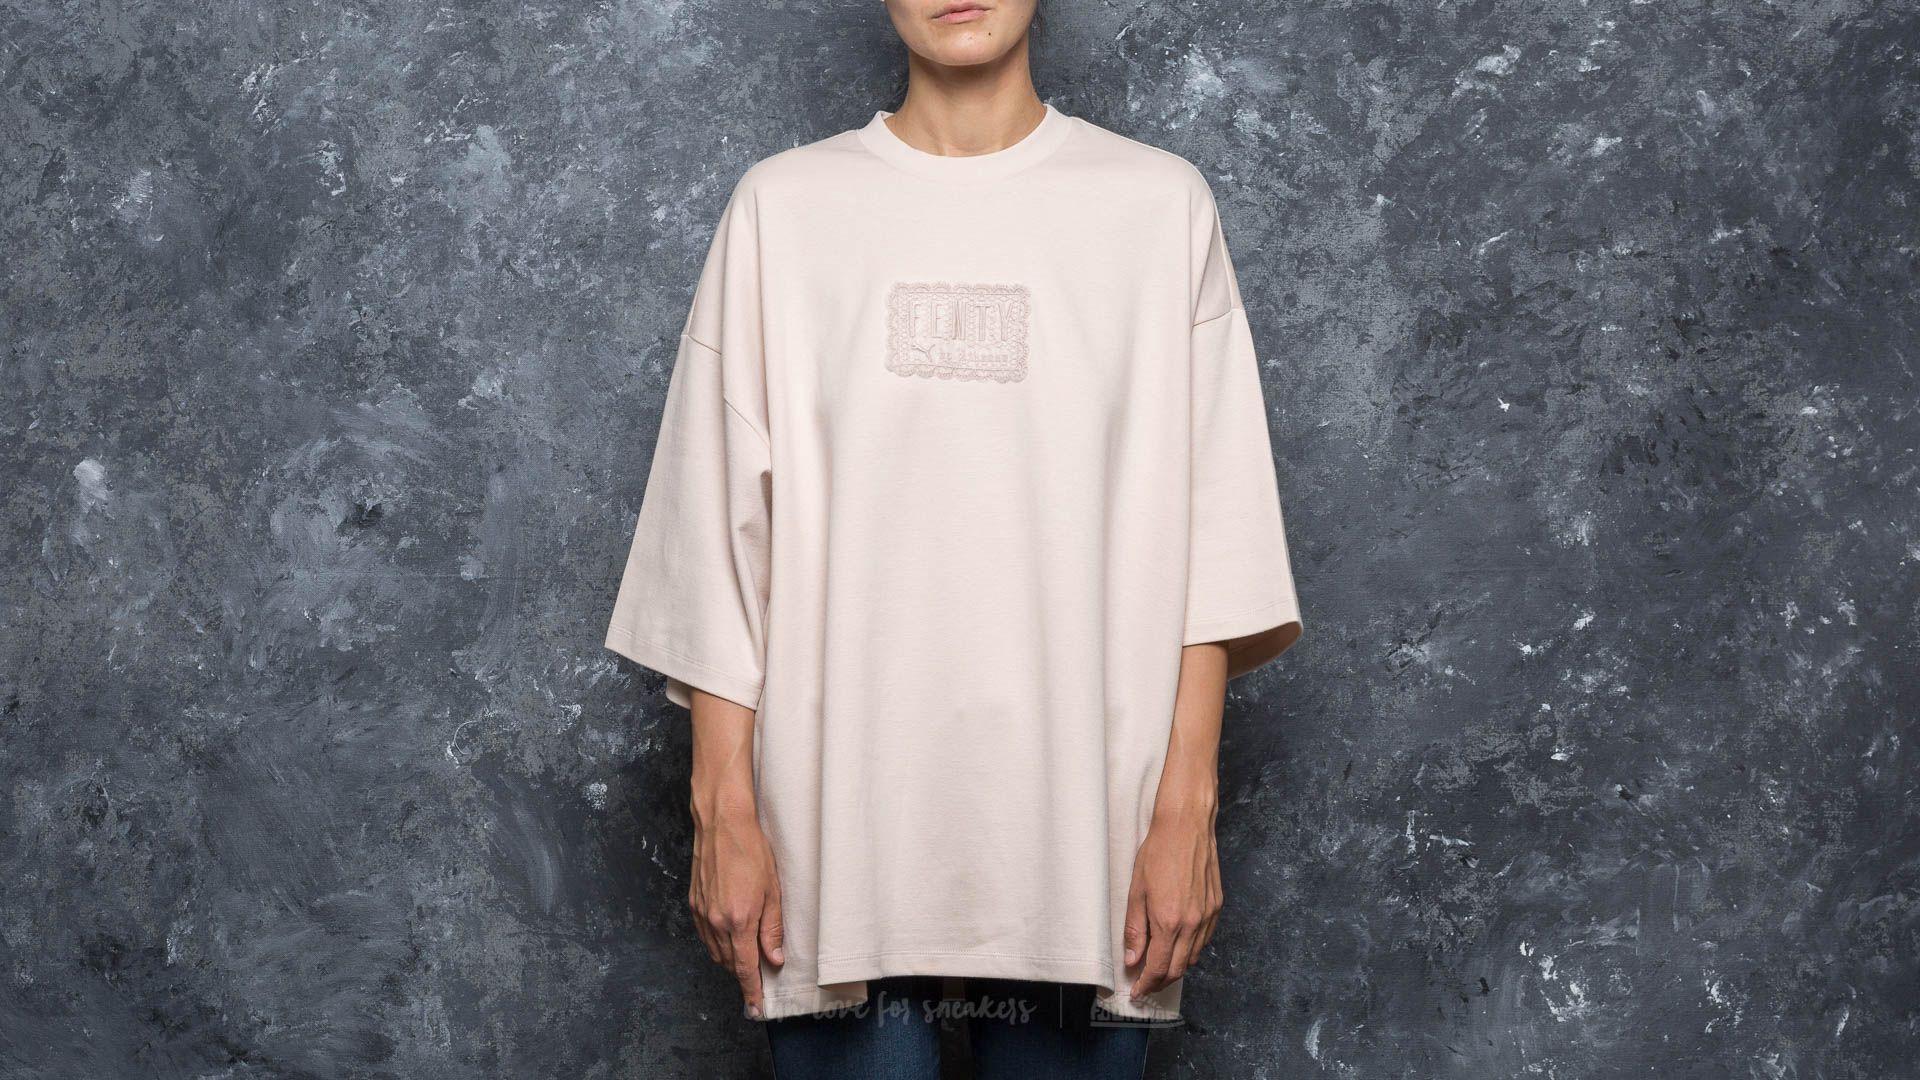 buy online e2614 31f3e Puma Fenty x Rihanna Oversized Crew Neck T-Shirt Pink Tint ...